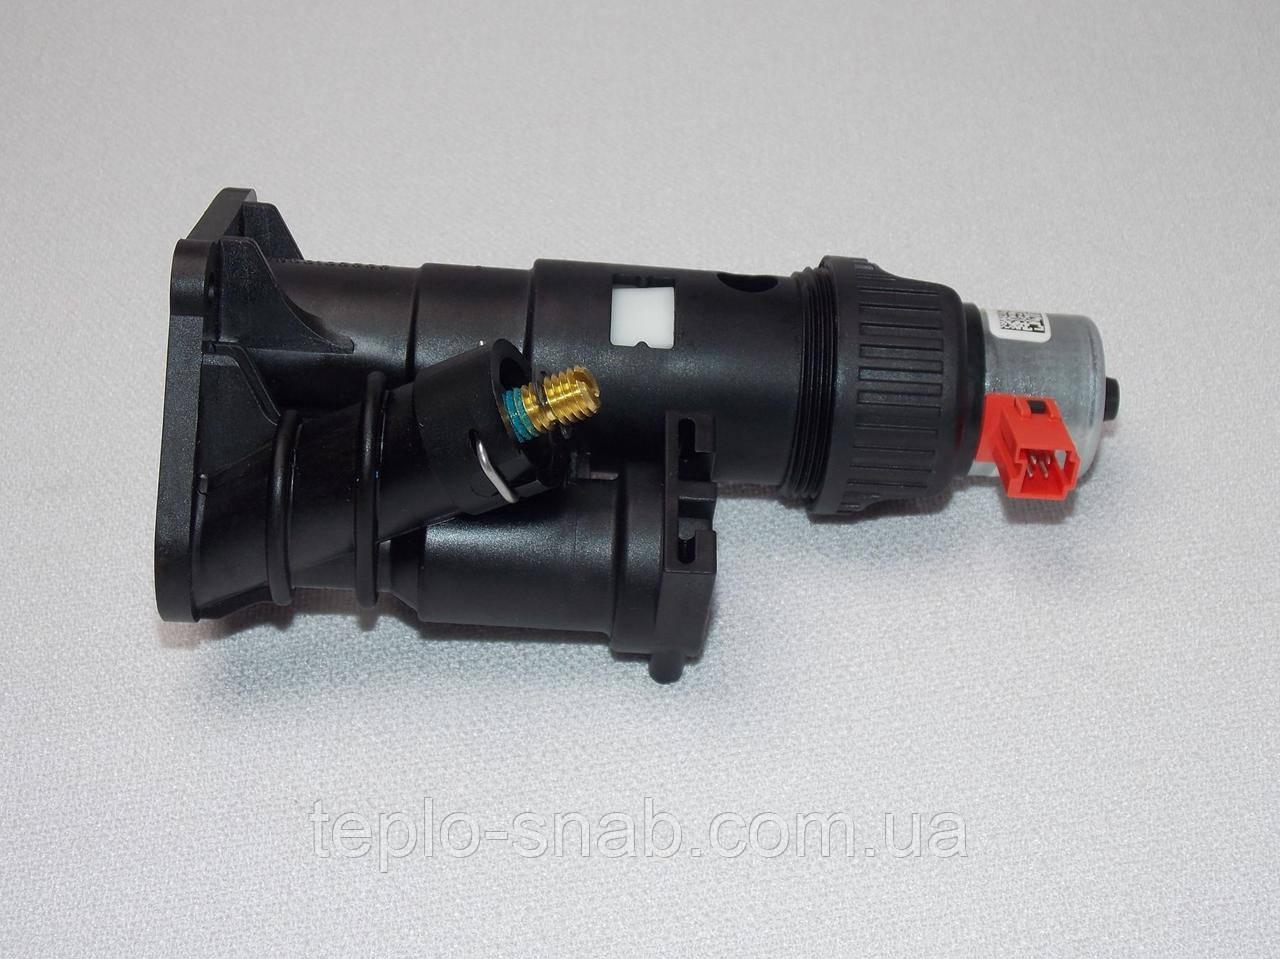 3-х ходовий клапан Protherm Пантера v18. 178978, 0020014168 (0020020015)